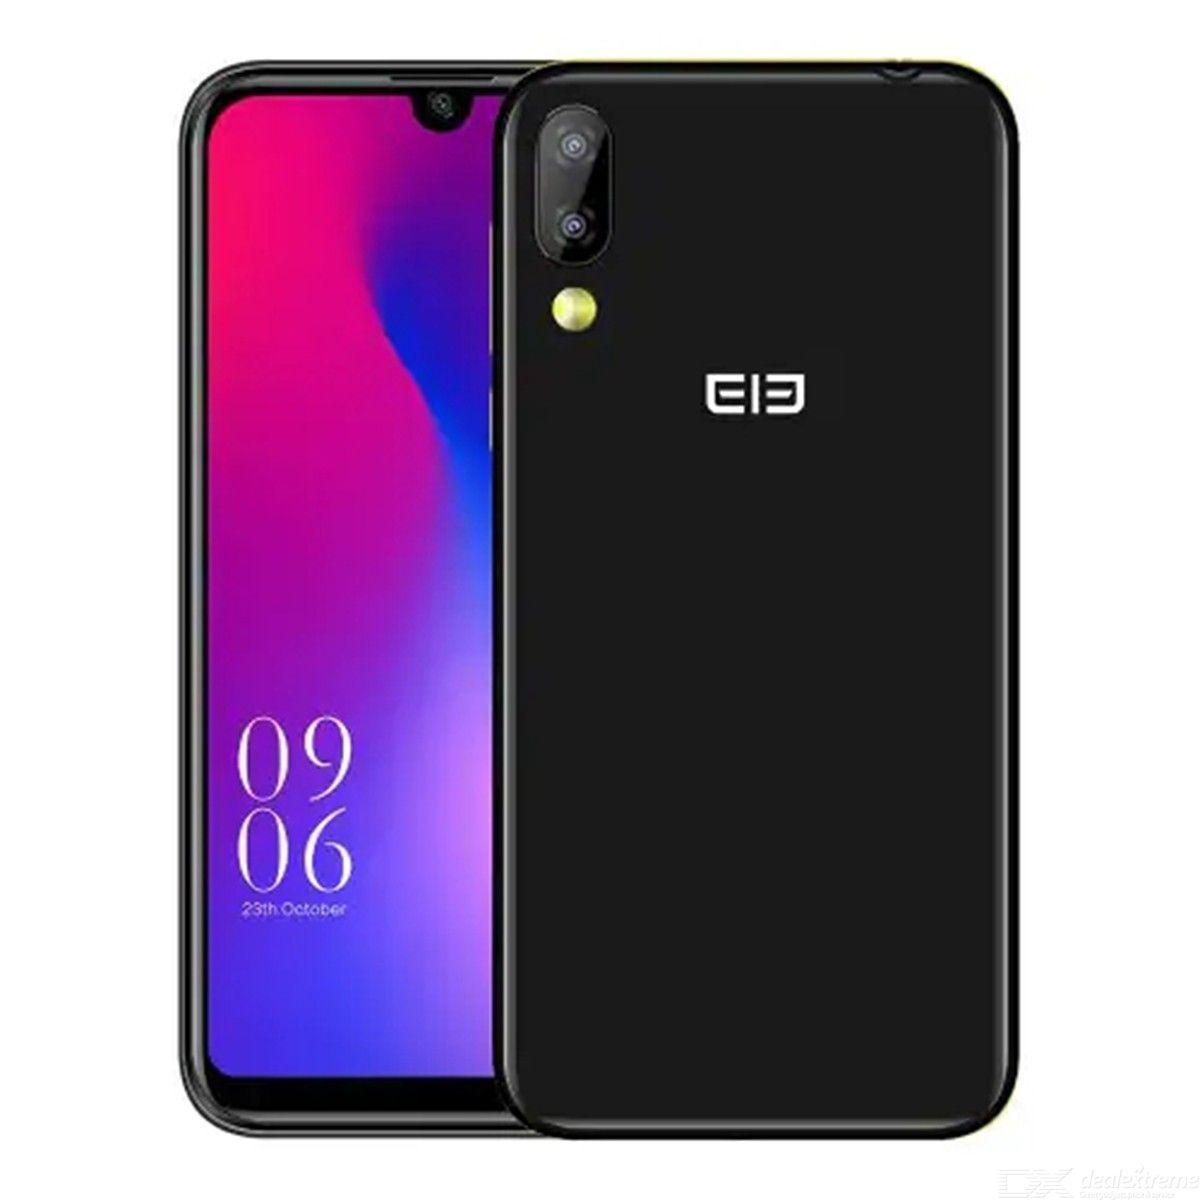 "[Pré-commande] Smartphone 5.71"" Elephone A6 Mini - double-SIM, HD+, Helio A22, 4 Go de RAM, 32 Go, Android 9.0, 4G (B20), bleu ou noir"